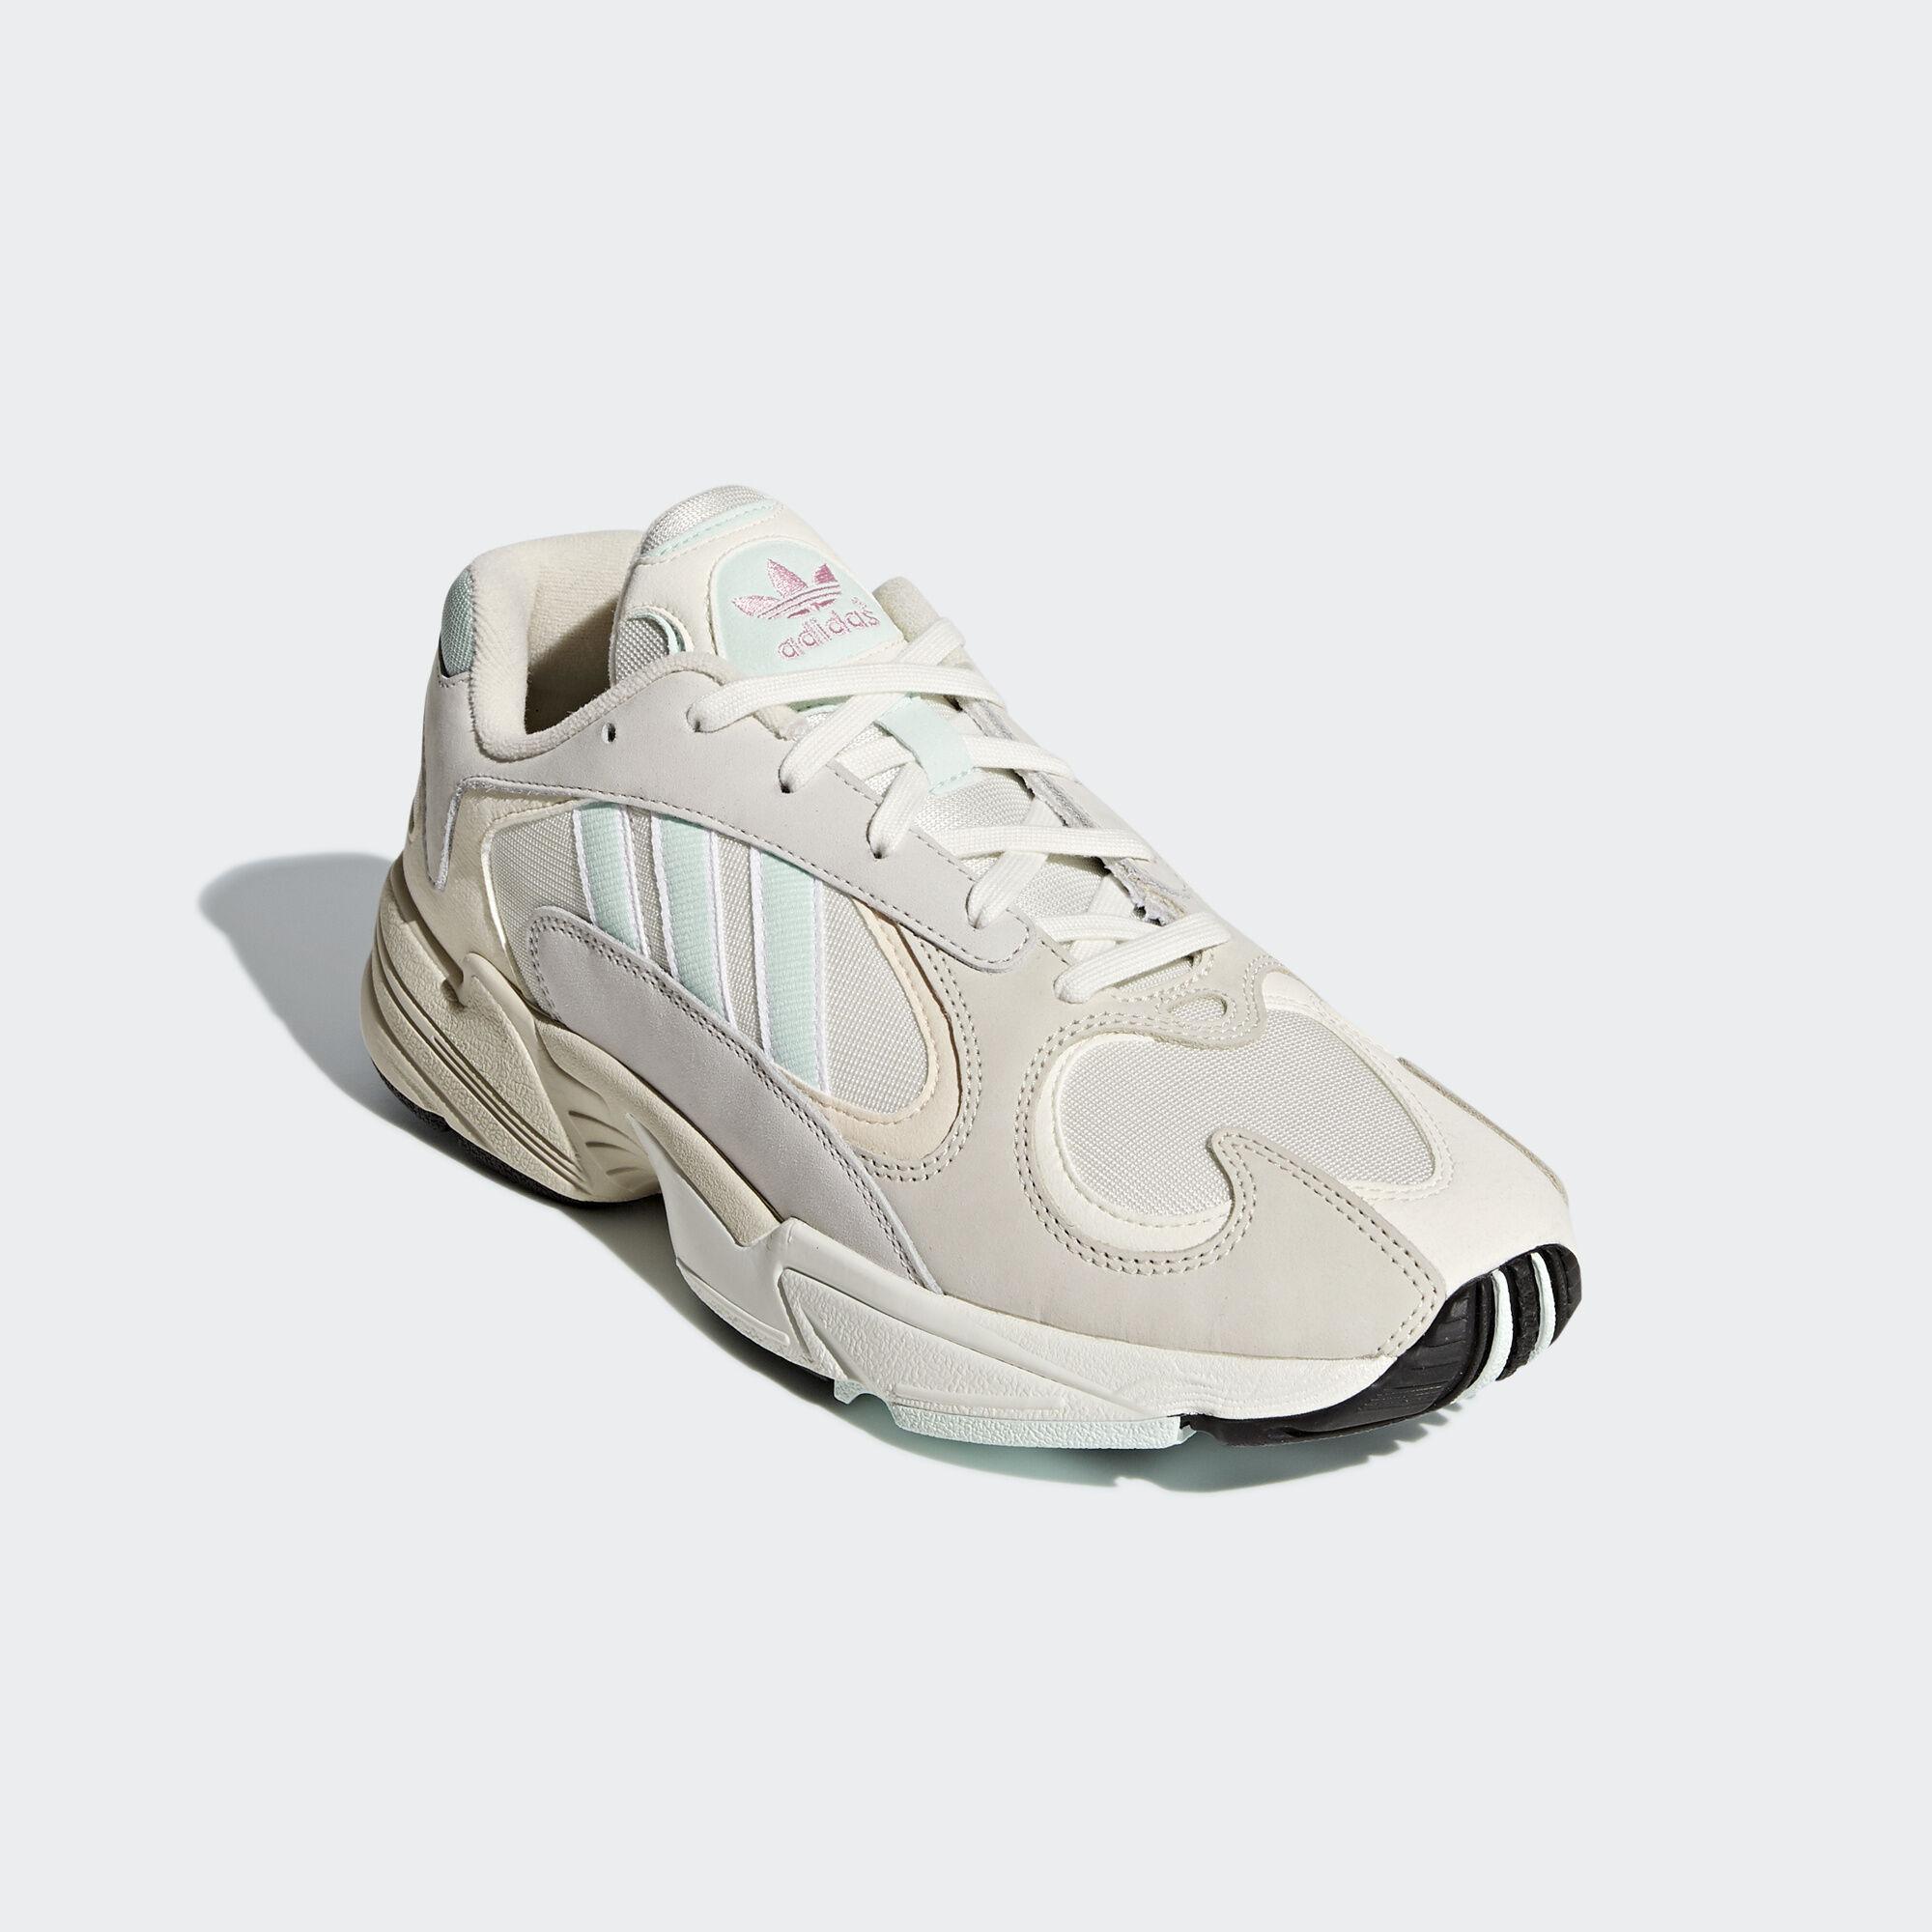 Adidas Yung-1 Beige / Ice Mint / Ecru Tint (CG7118)